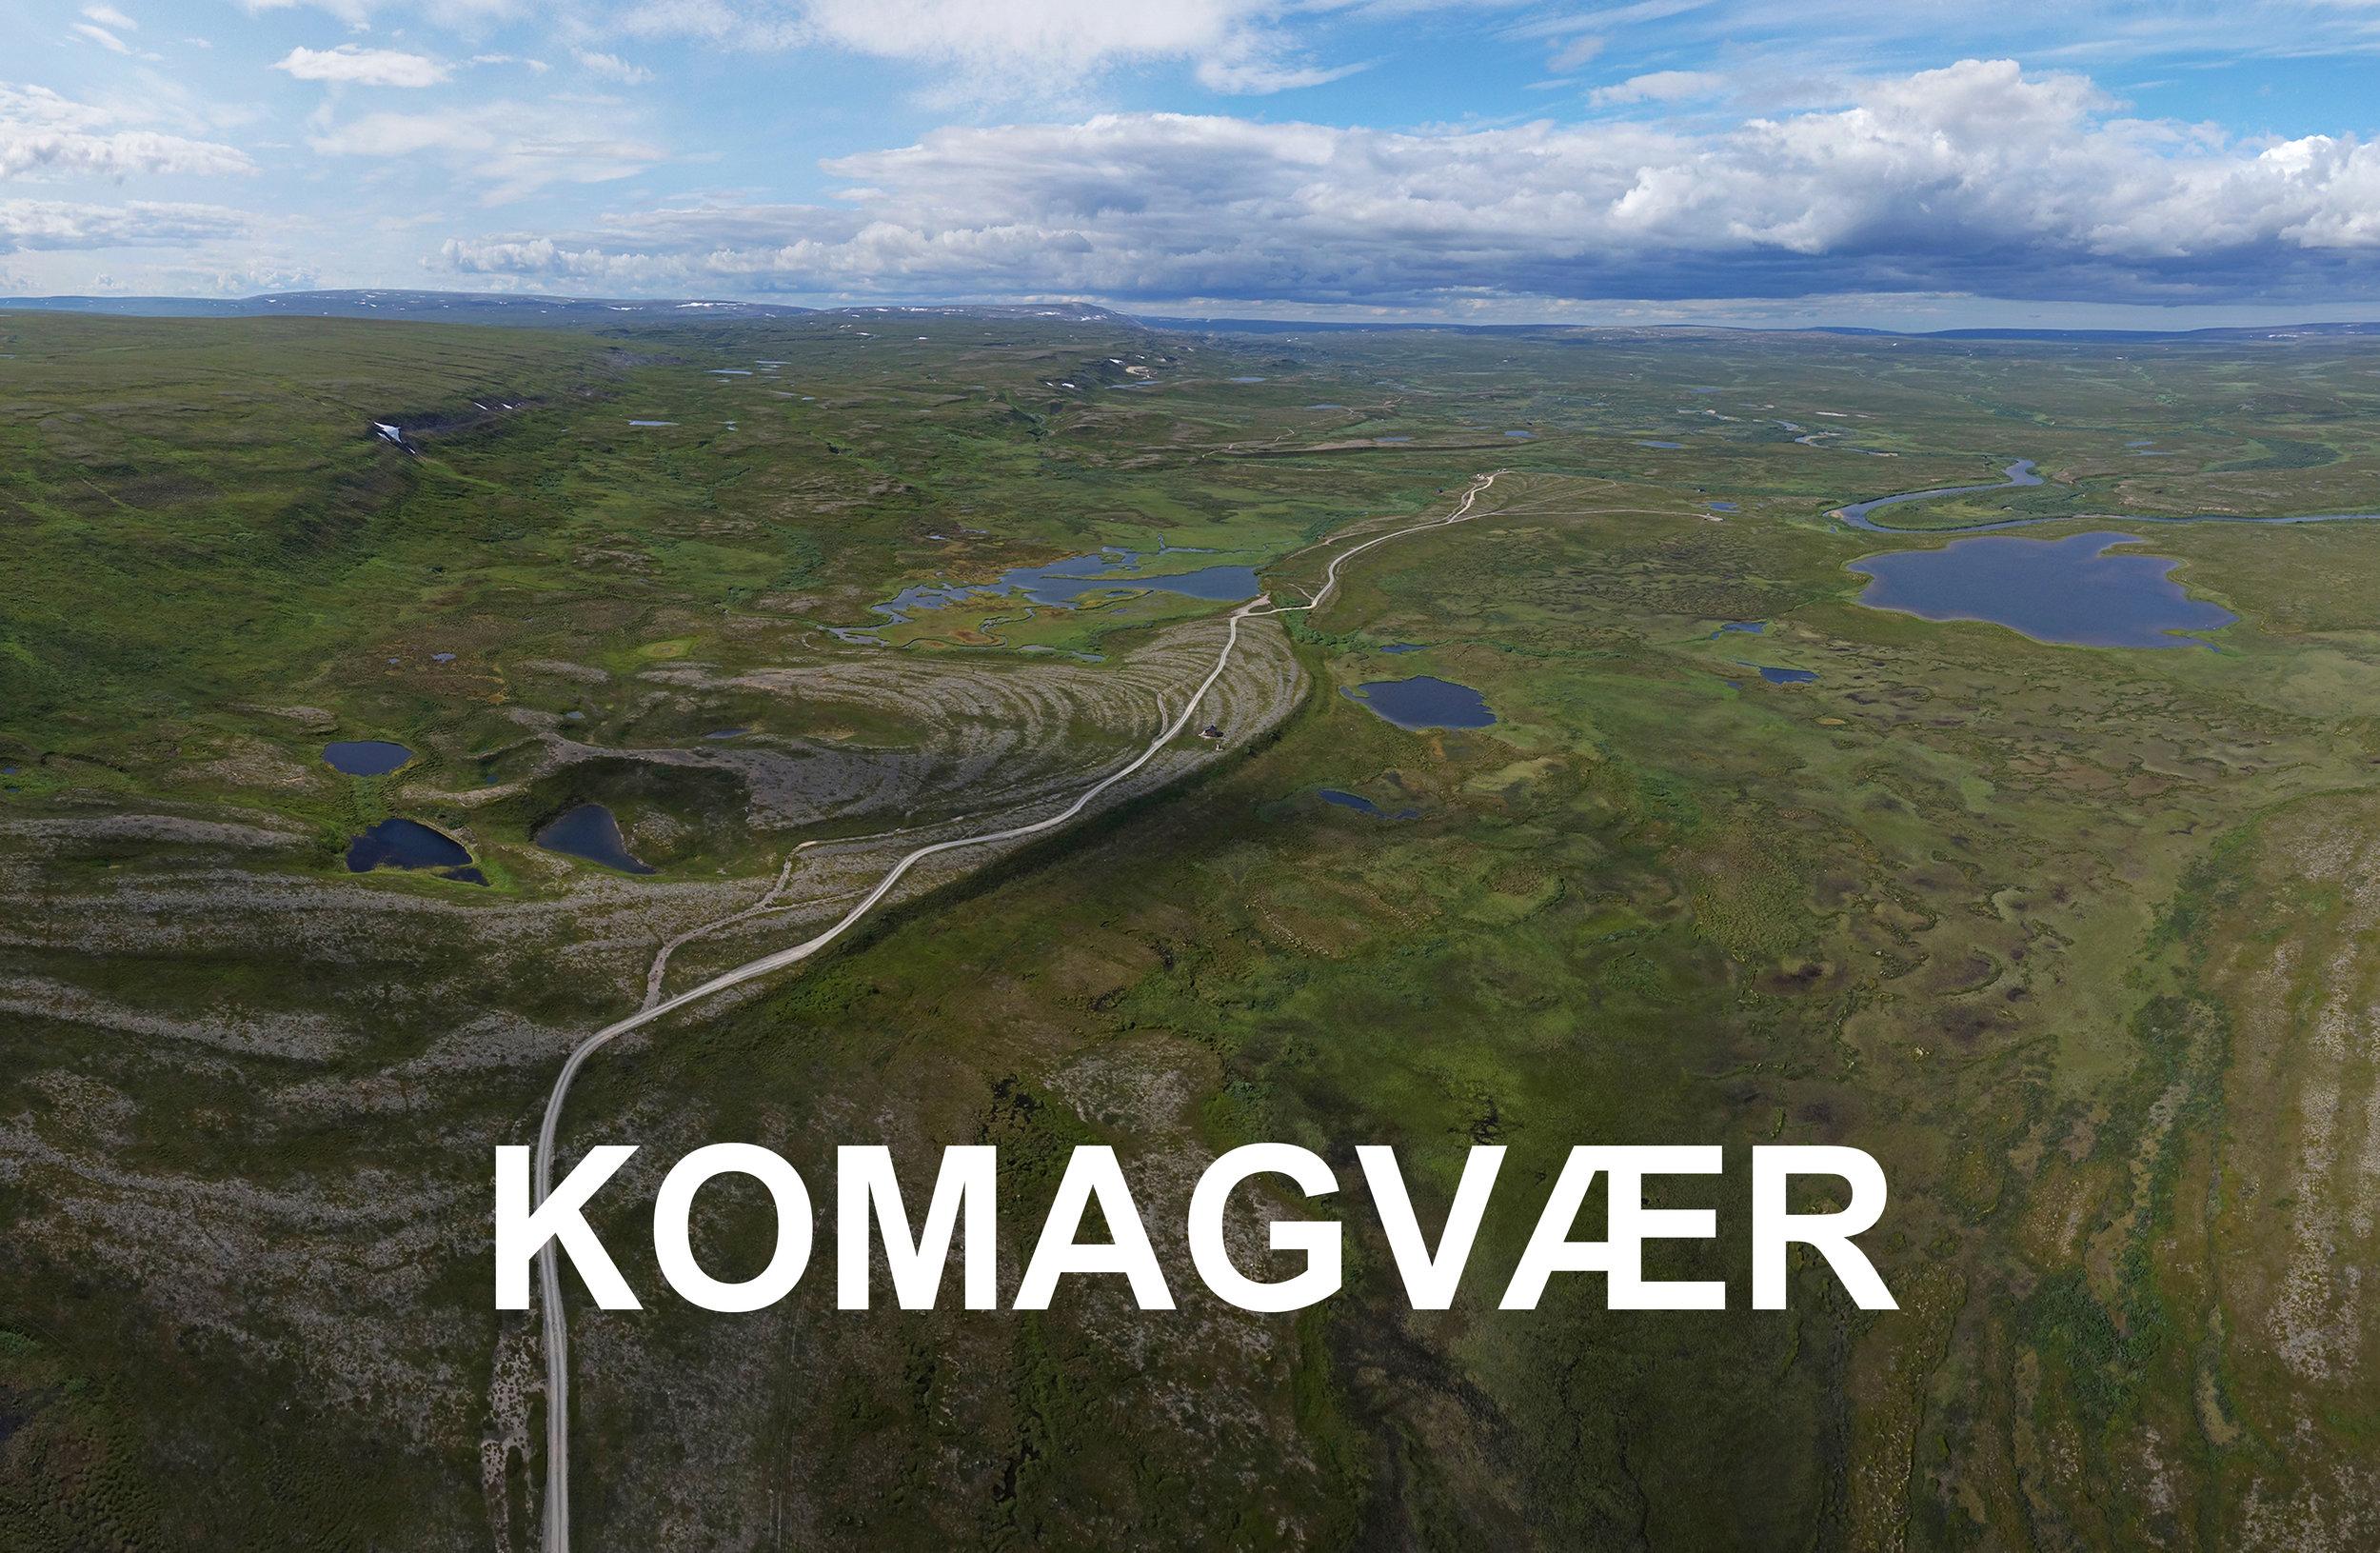 Komagvær_Varanger_Copyright_Biotope